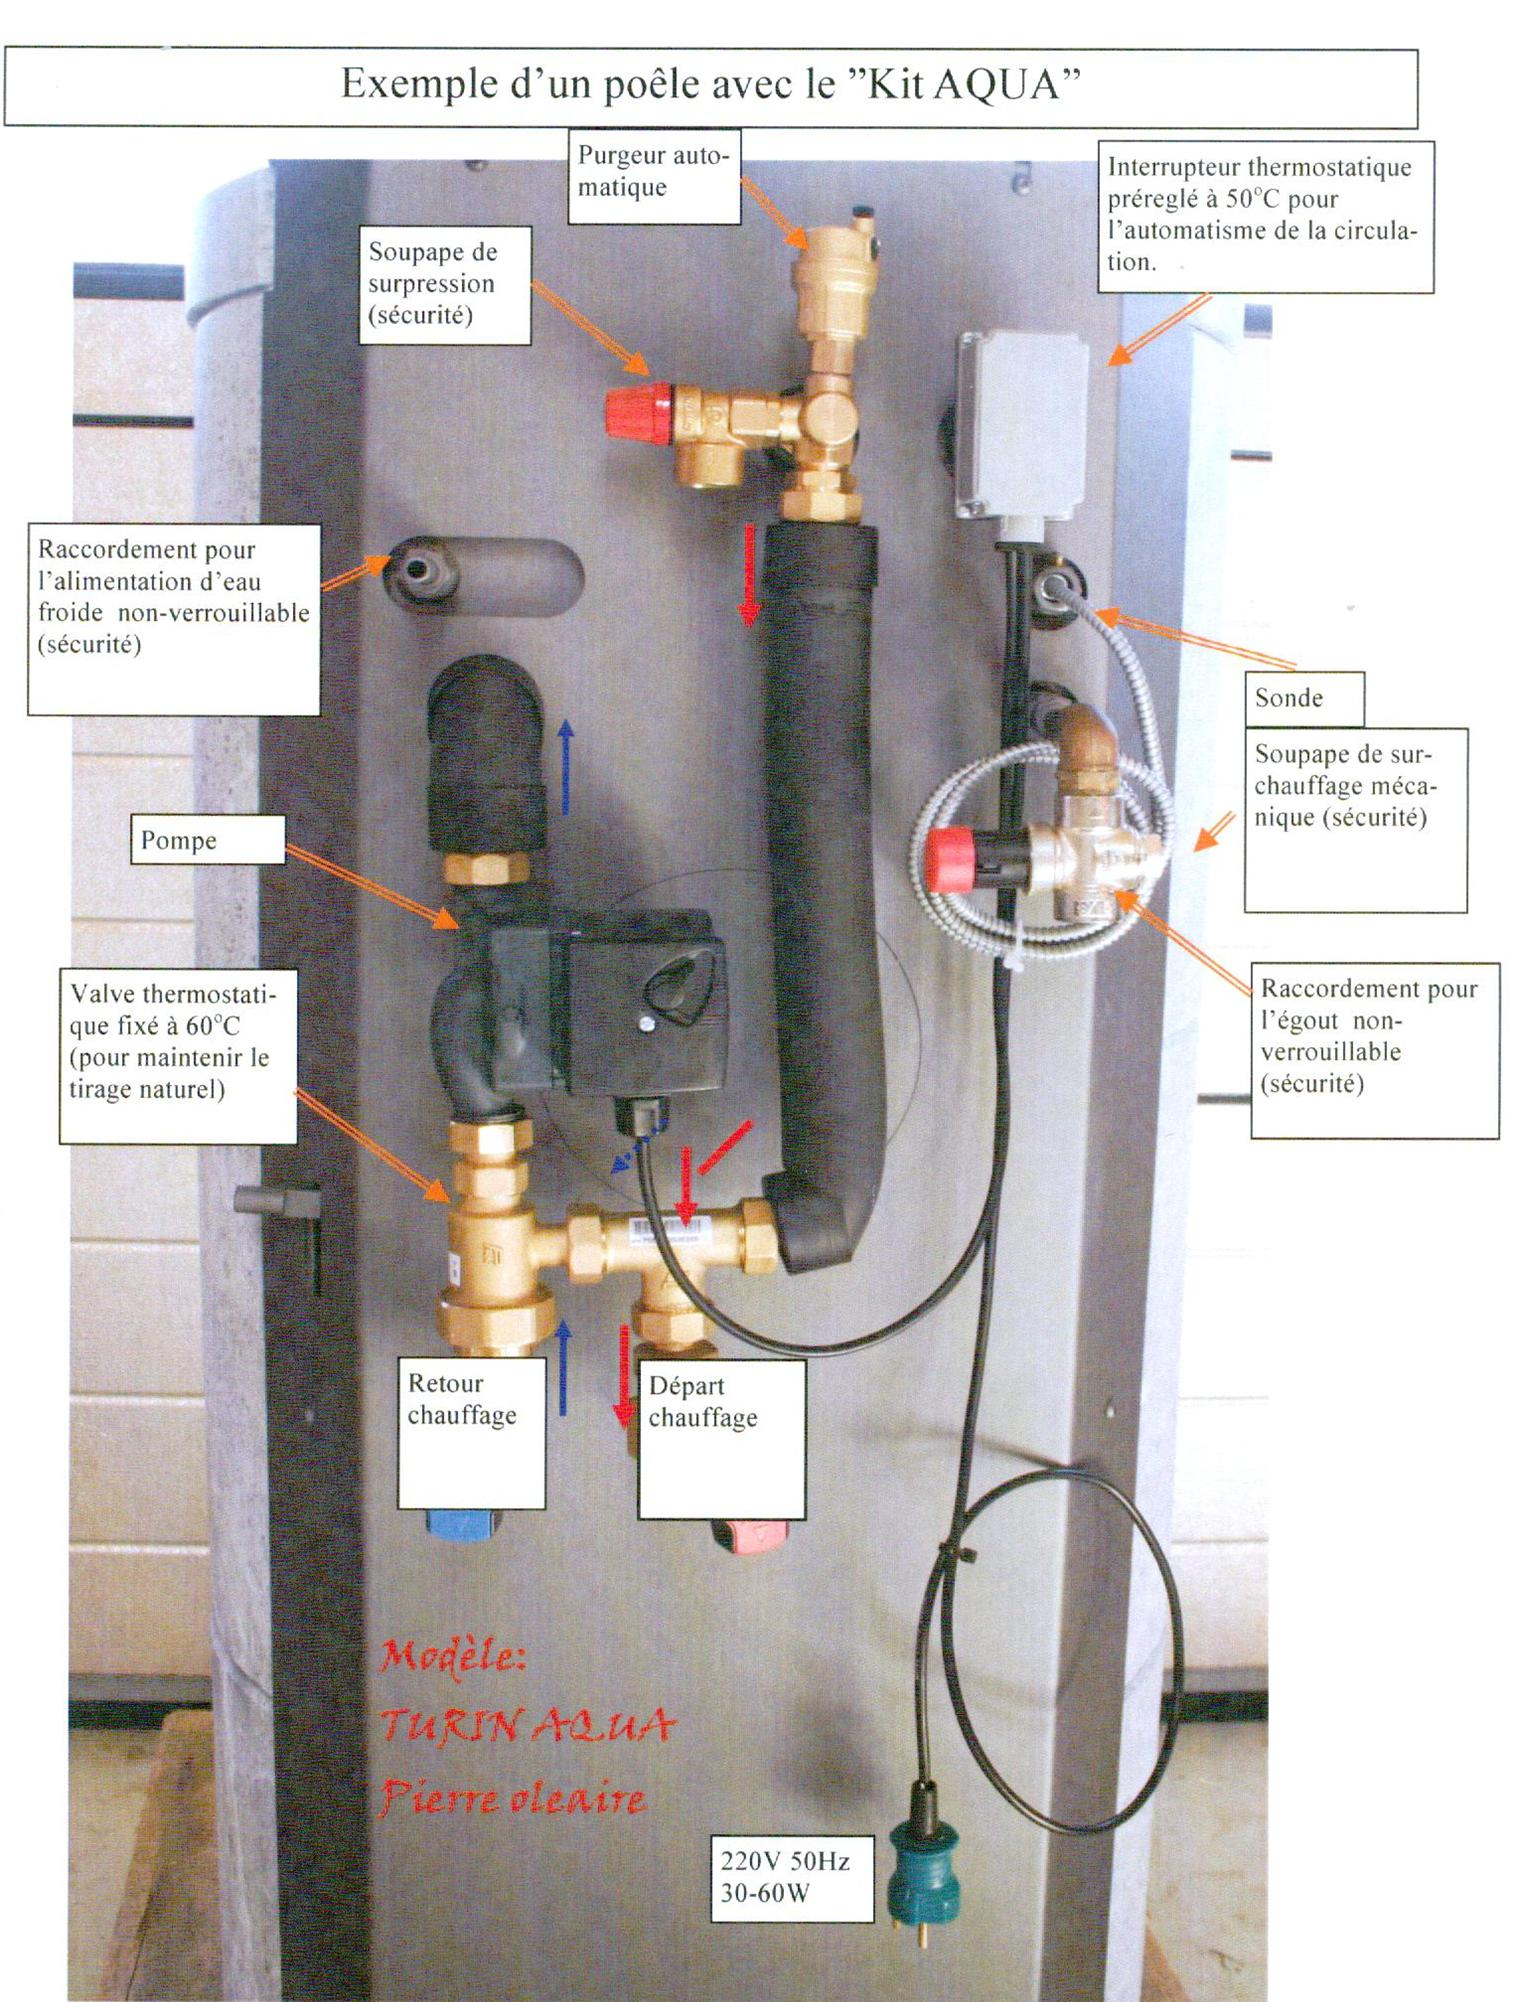 kit aqua pour heta 800 heta sl 580 r f chauffage solutions chauffage central. Black Bedroom Furniture Sets. Home Design Ideas